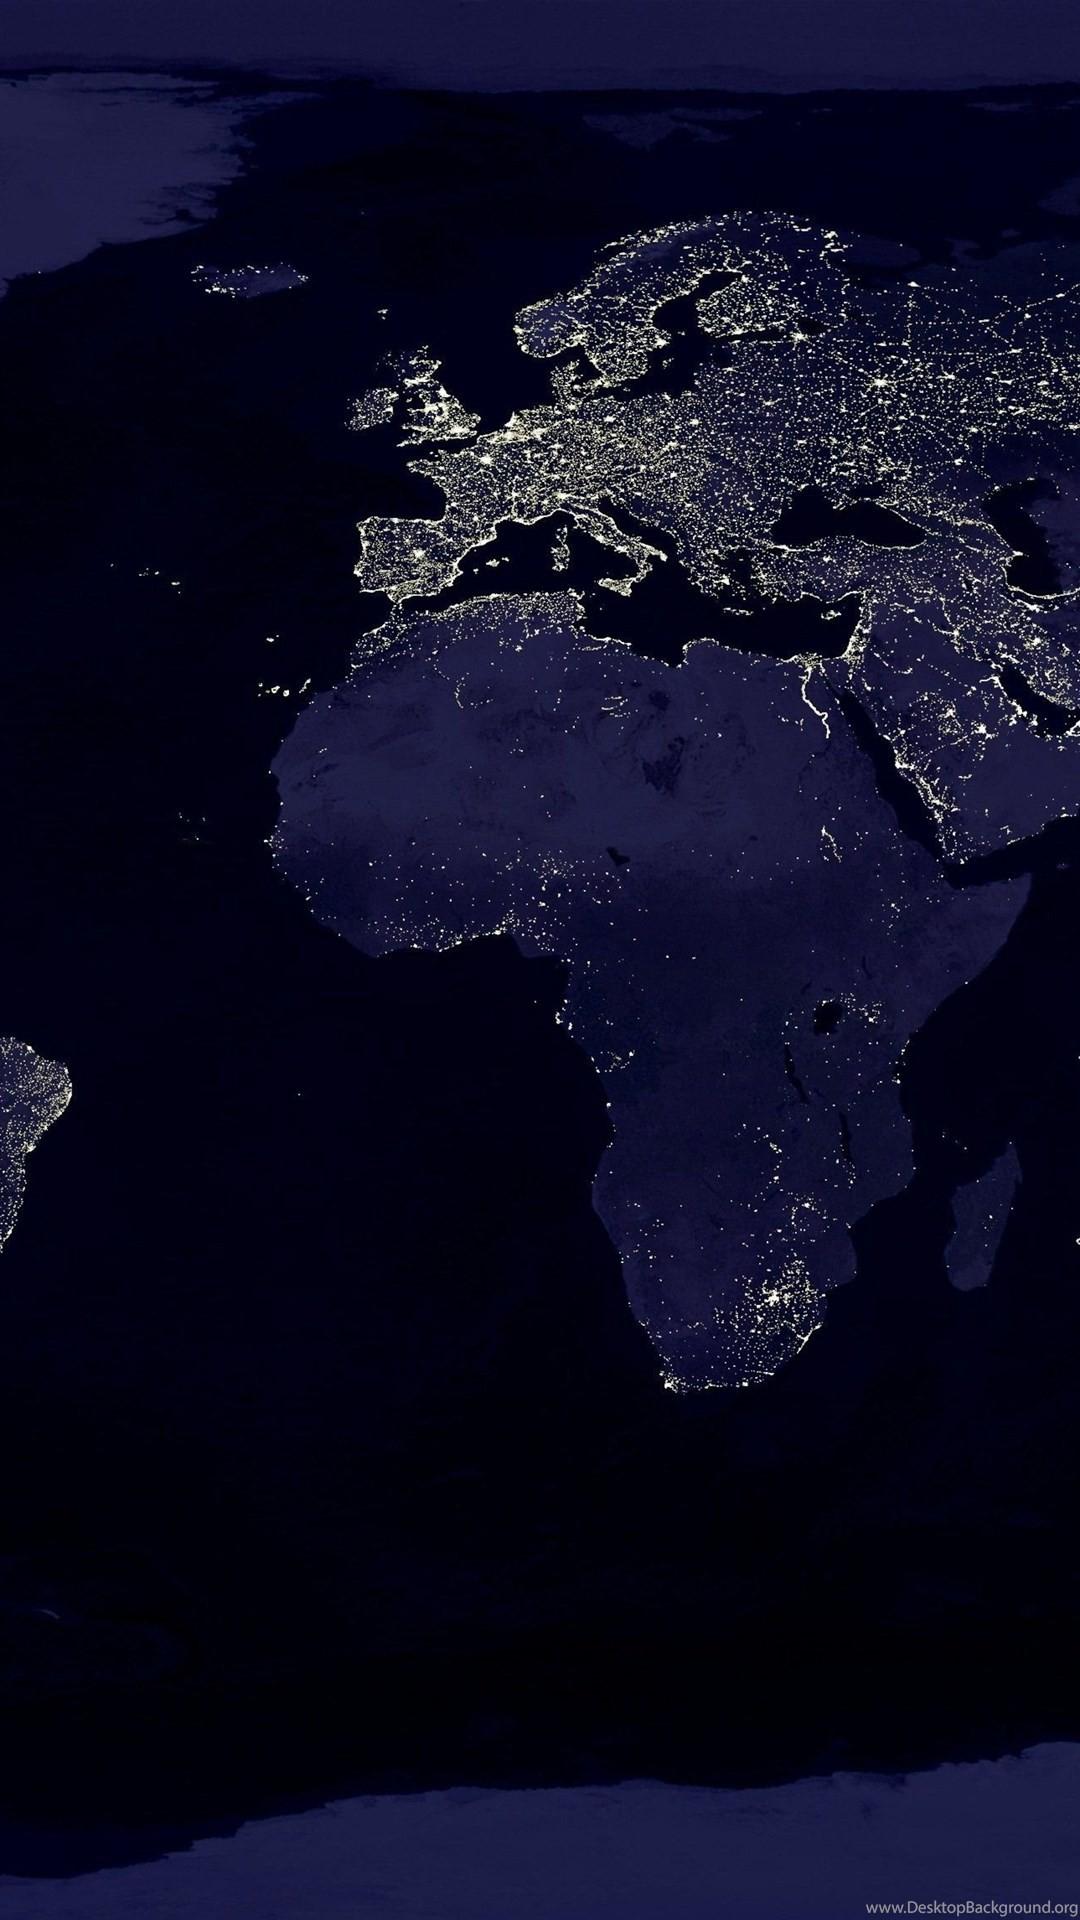 World At Night Wallpaper 73 Images